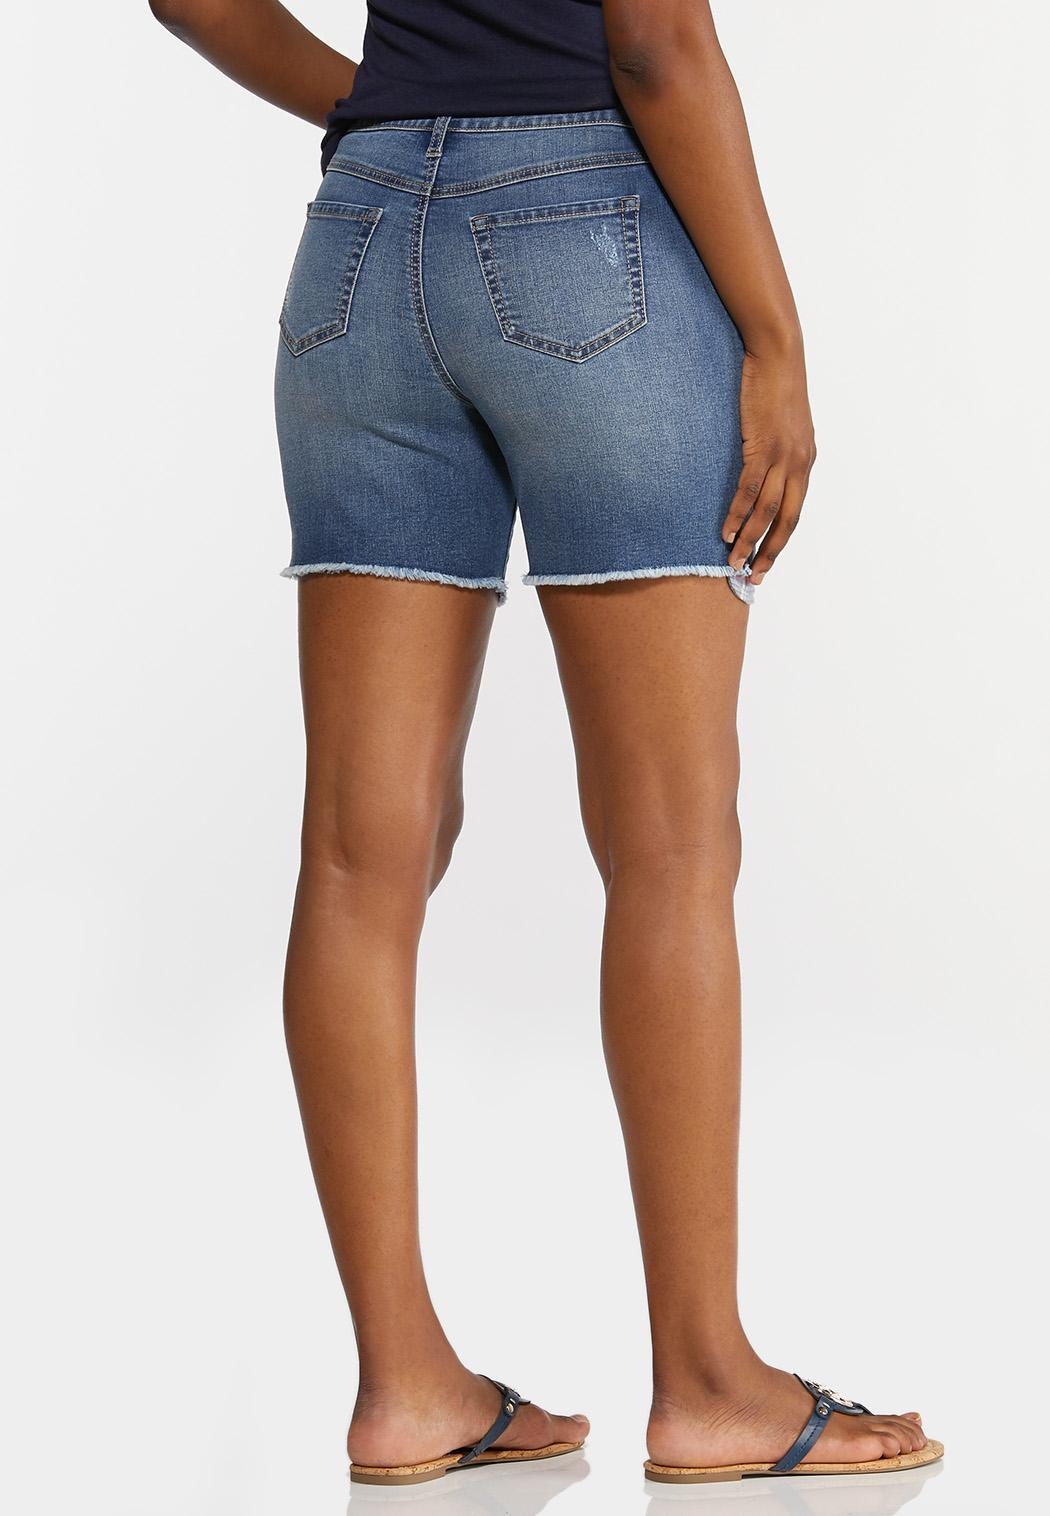 Peek-A-Boo Patchwork Denim Shorts (Item #44240435)